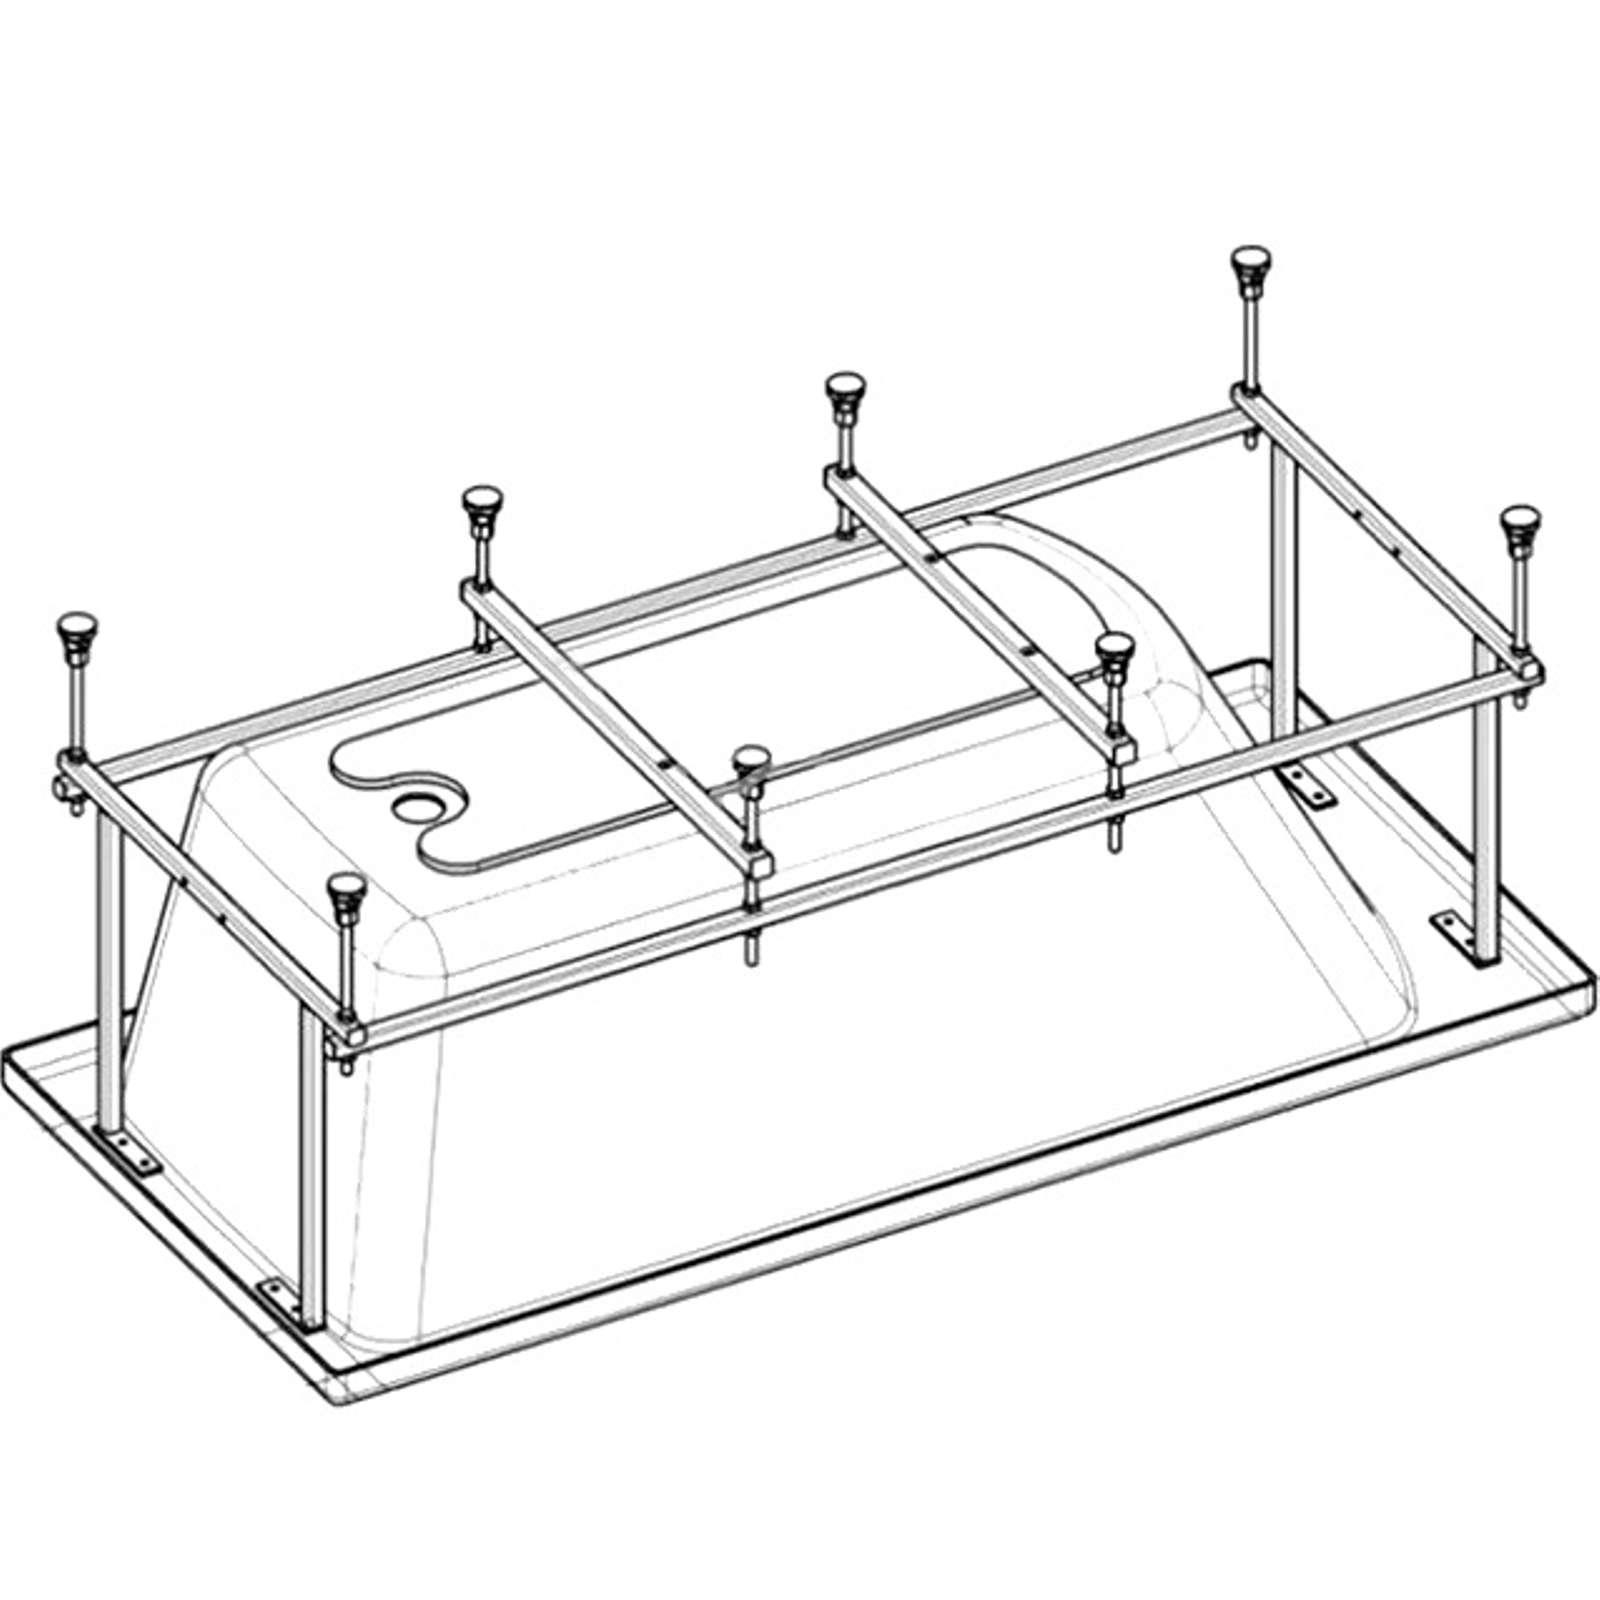 Монтажный комплект Roca к ванне Easy 170Х75 см